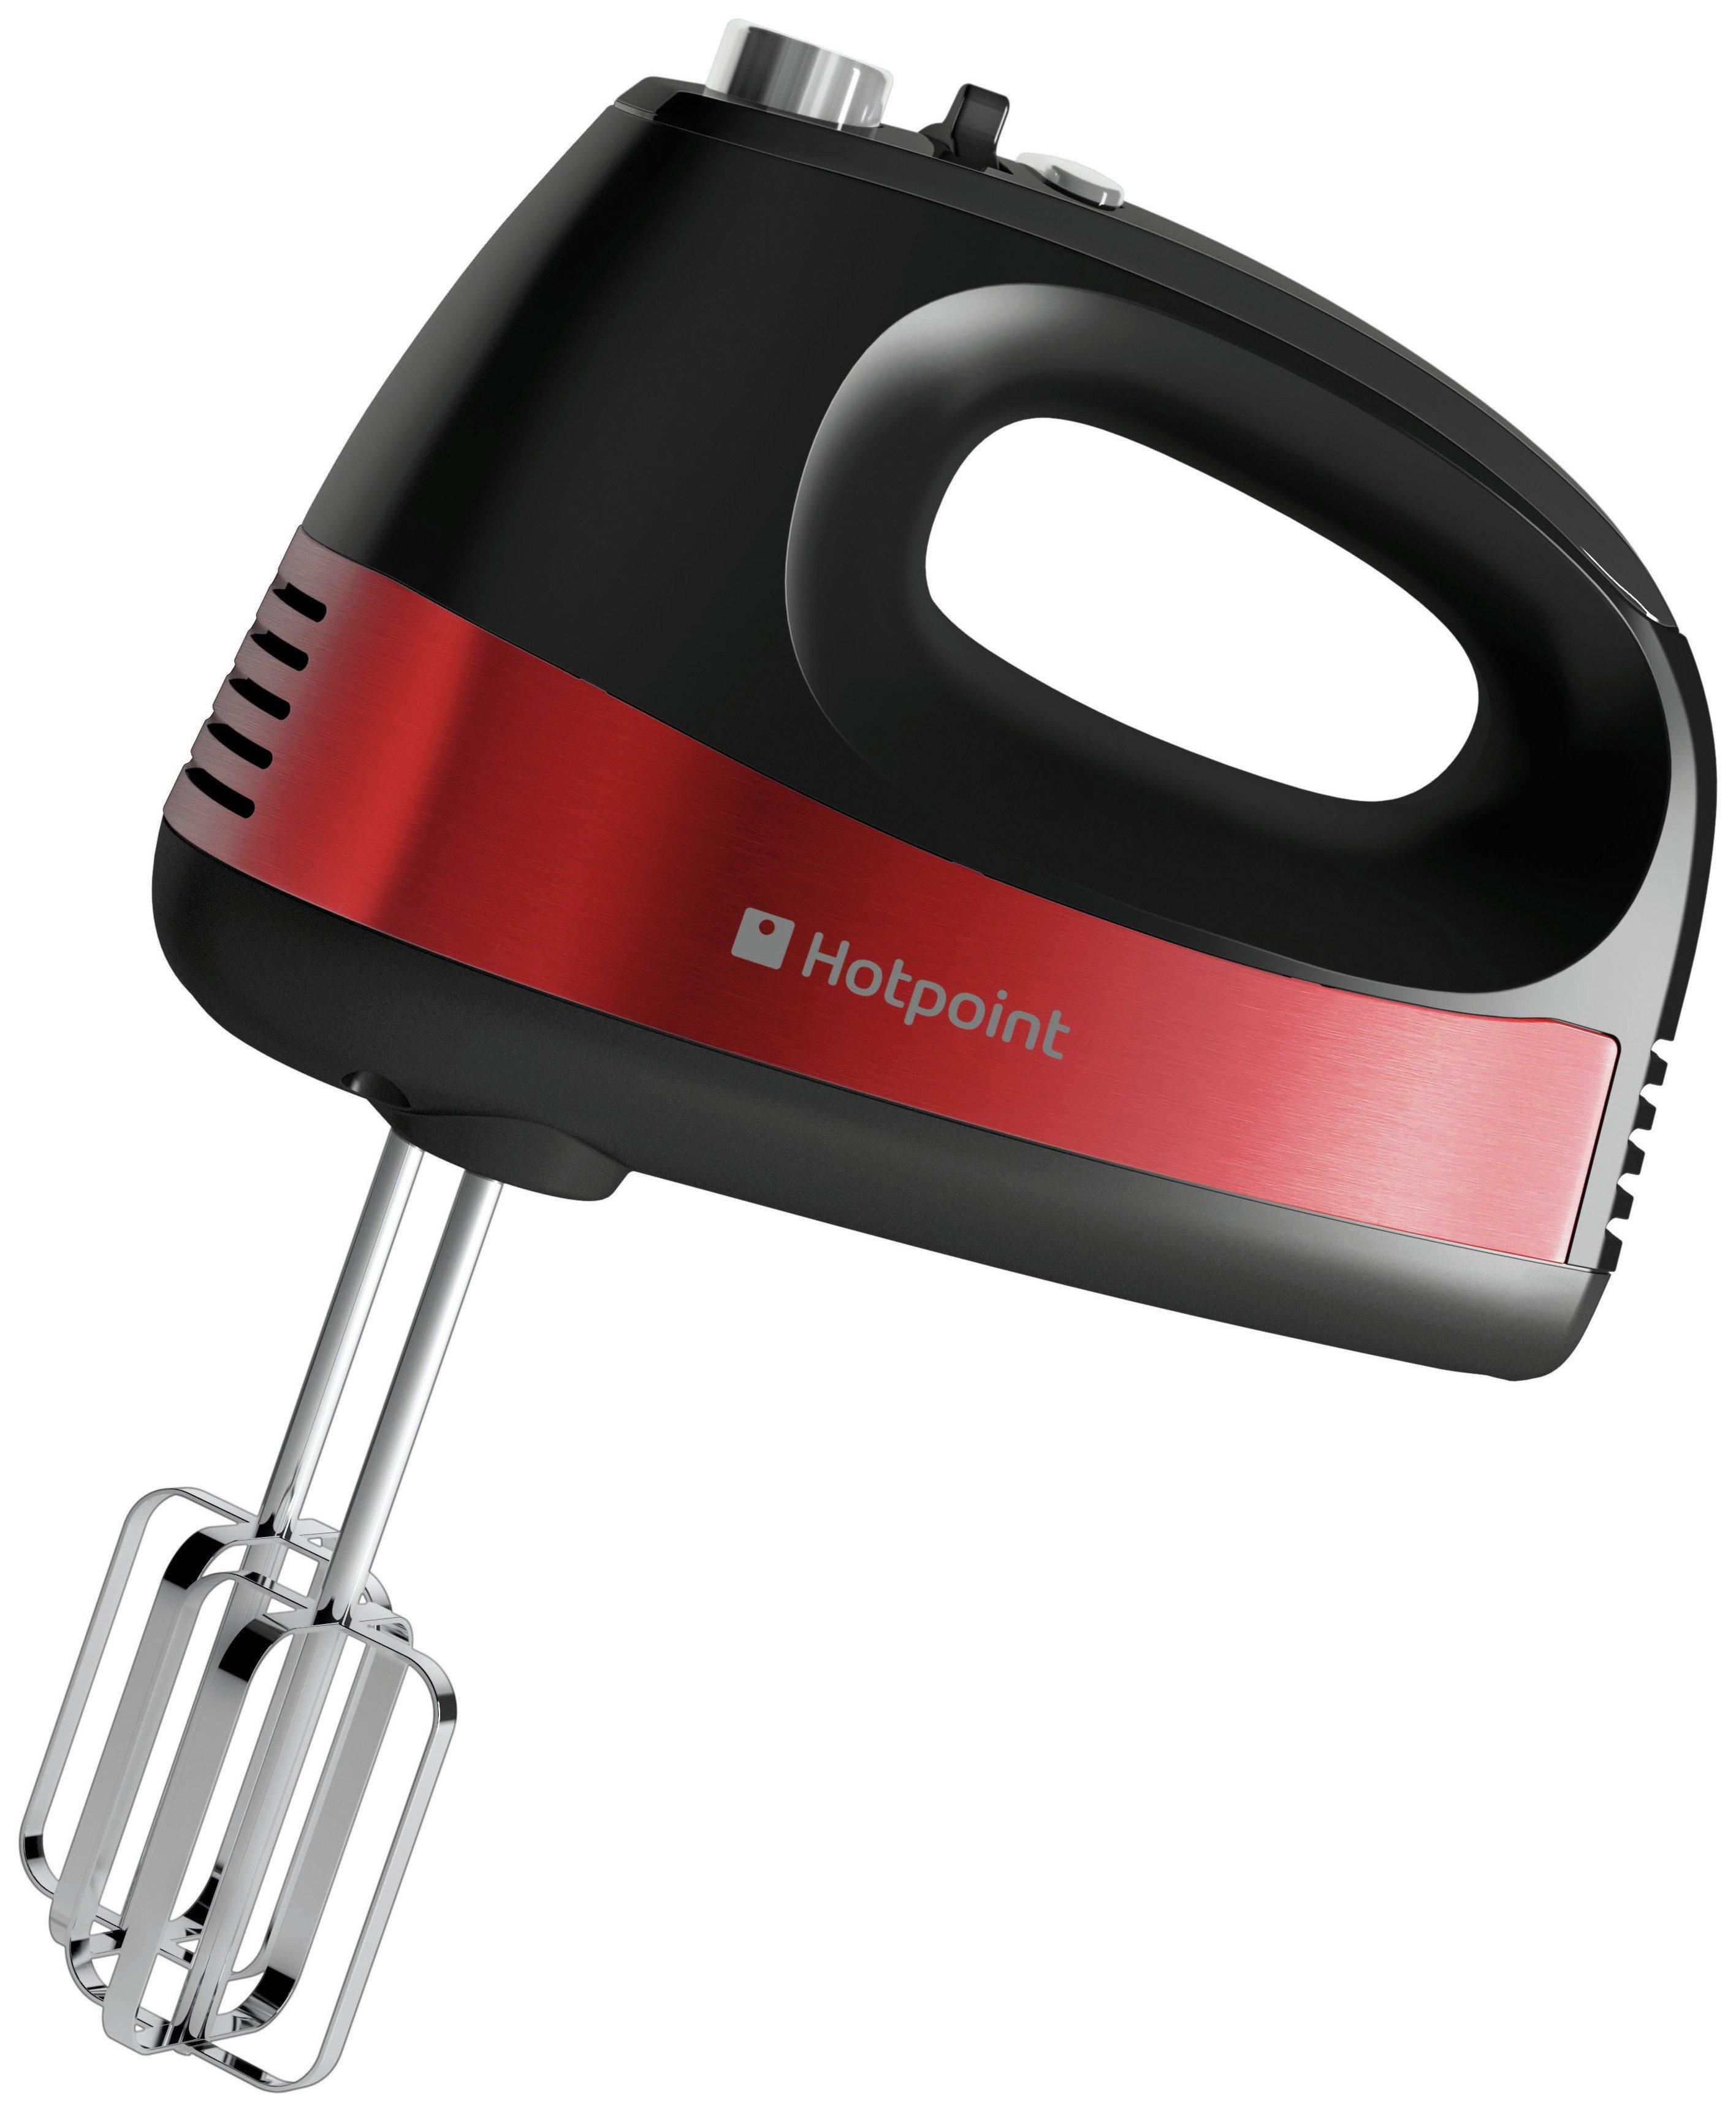 food mixers kitchen mixer best food mixer compare food. Black Bedroom Furniture Sets. Home Design Ideas